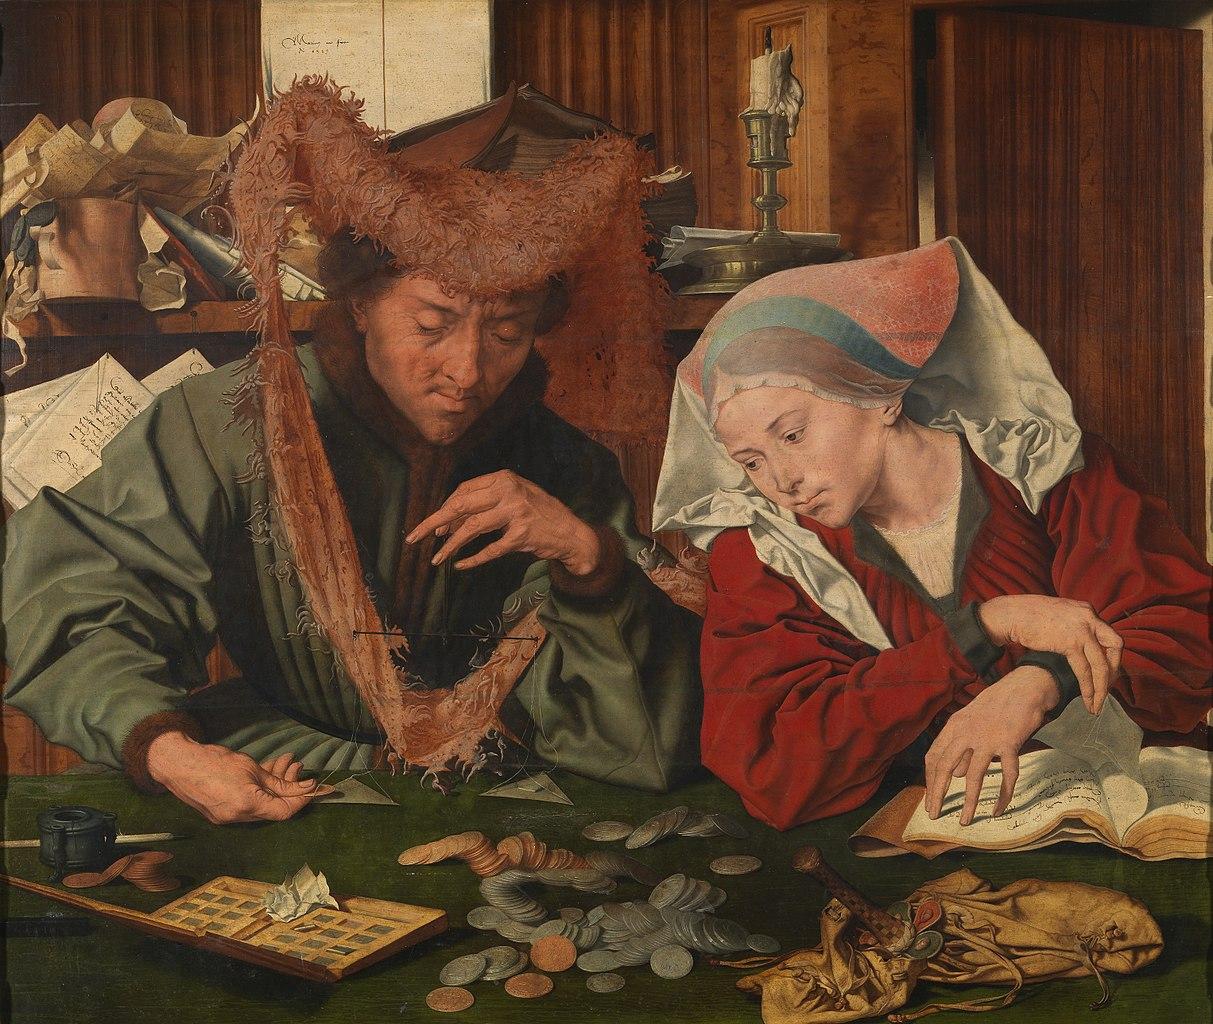 Маринус ван Реймерсвале. Меняла и его жена. 1539 г. Музей Прадо, Мадрид.